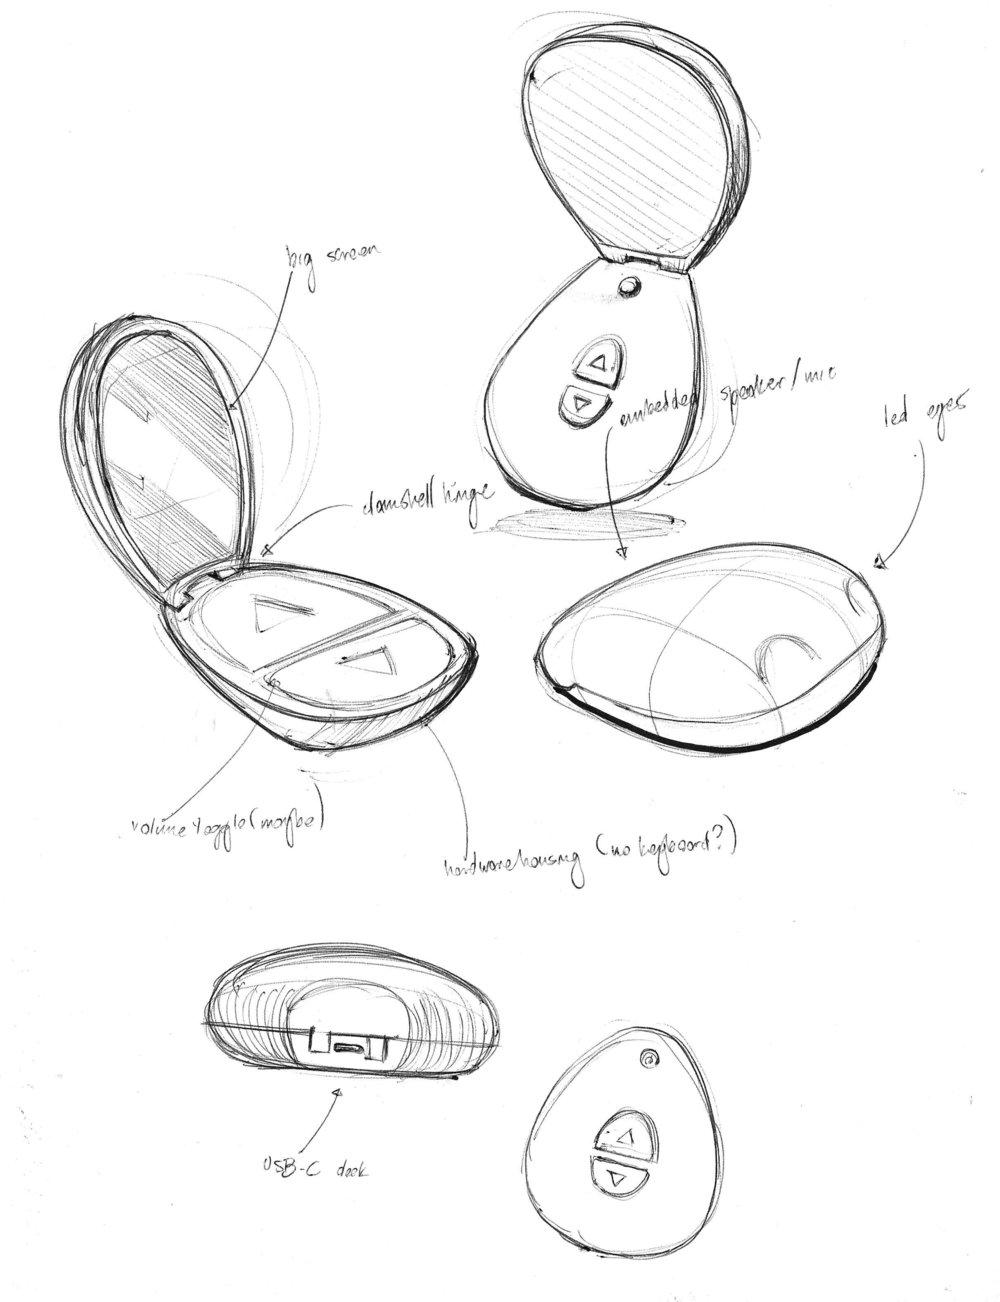 clamshell 2.jpg